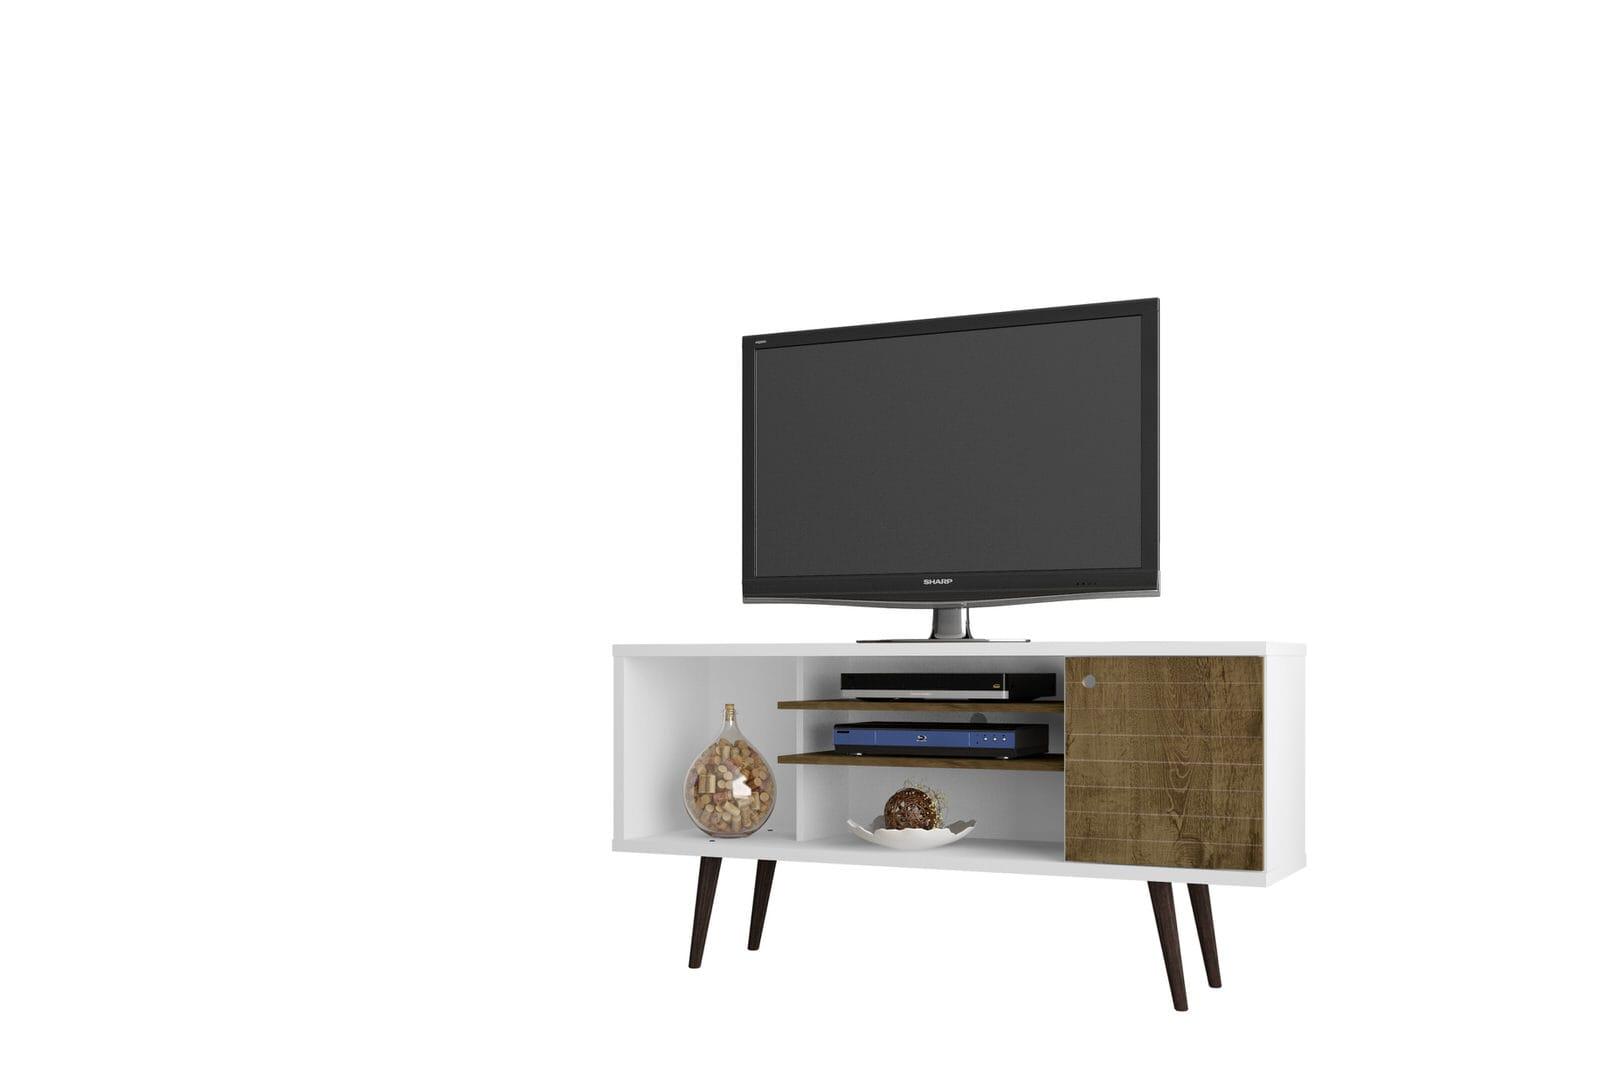 200AMC69 TVS